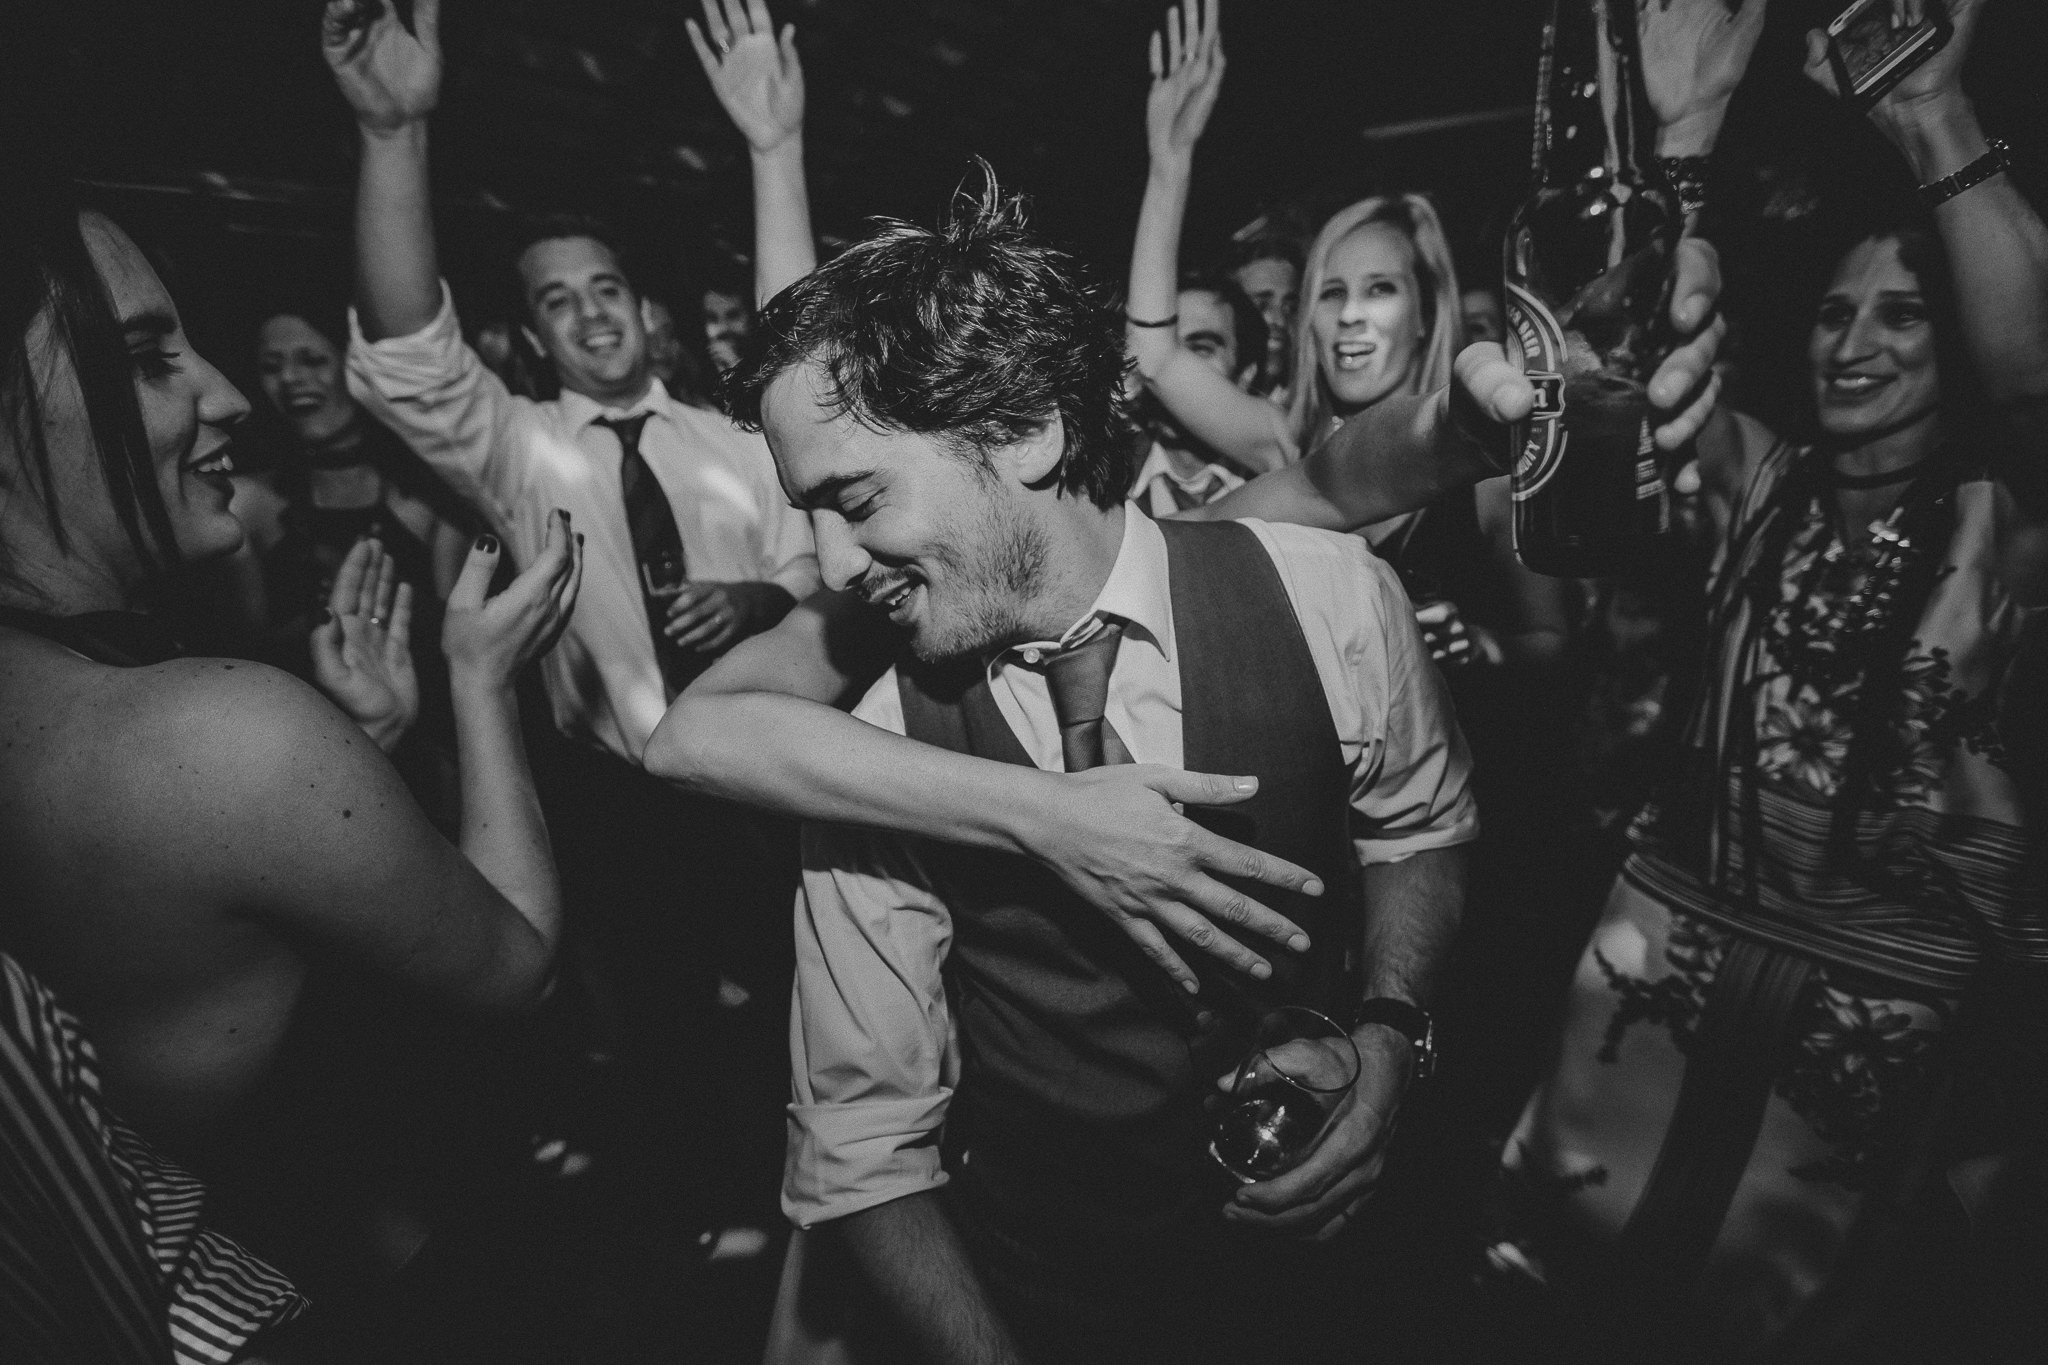 boda en lacrosse - fotografía espontánea de bodas - fotos de boda uruguay - P&I07